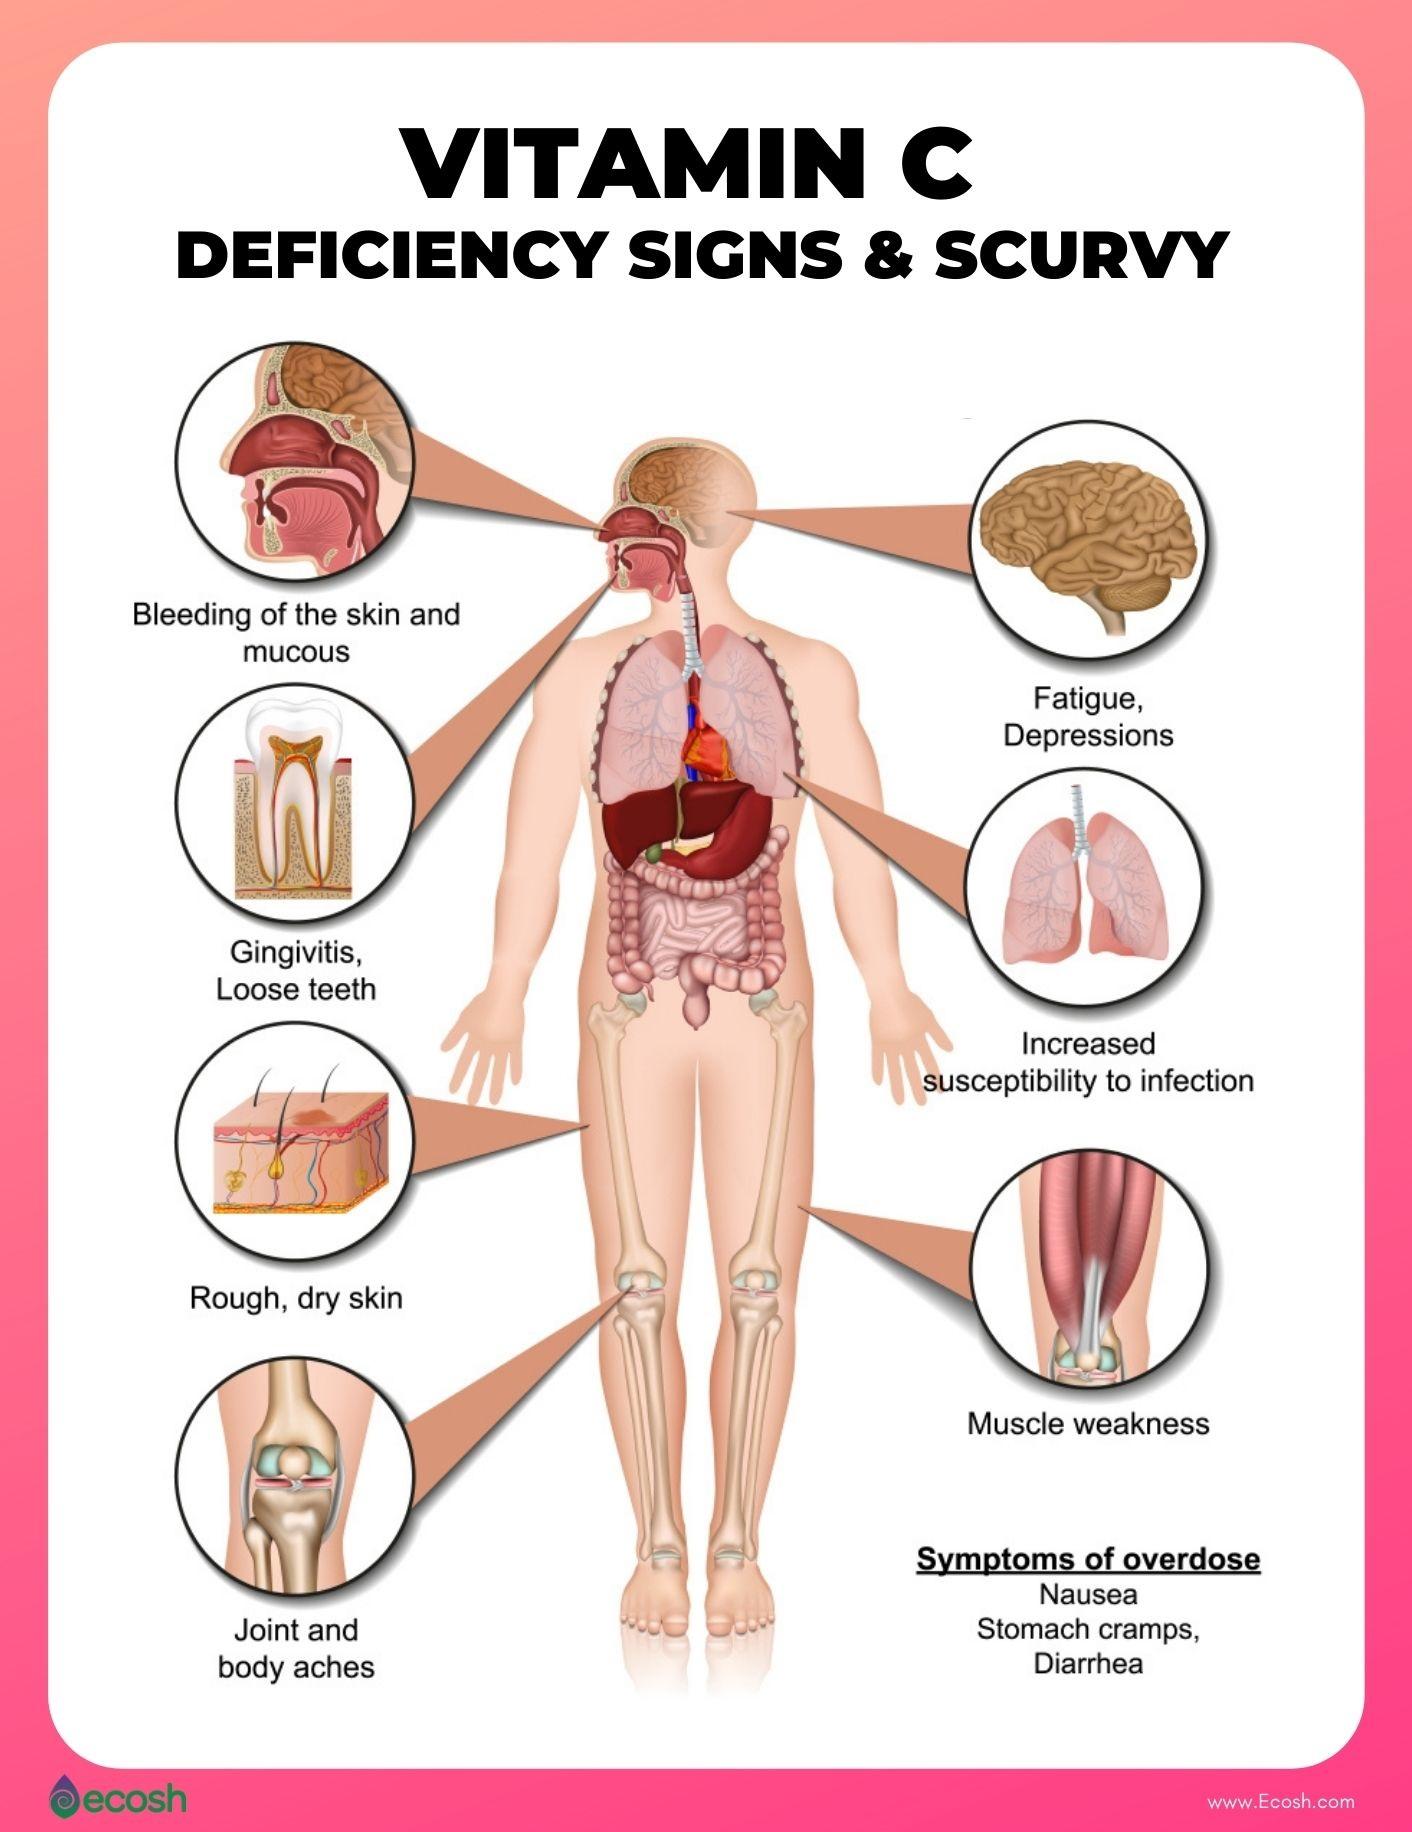 Ecosh_2020_Health_Benefits_of_Vitamin_C_Ascorbic_Acid_Vitamin_C_Deficiency_Symptoms__Vitamin_C_Deficiency_Signs_Scurvy_Treatment_Scurvy_Natural_Treatment